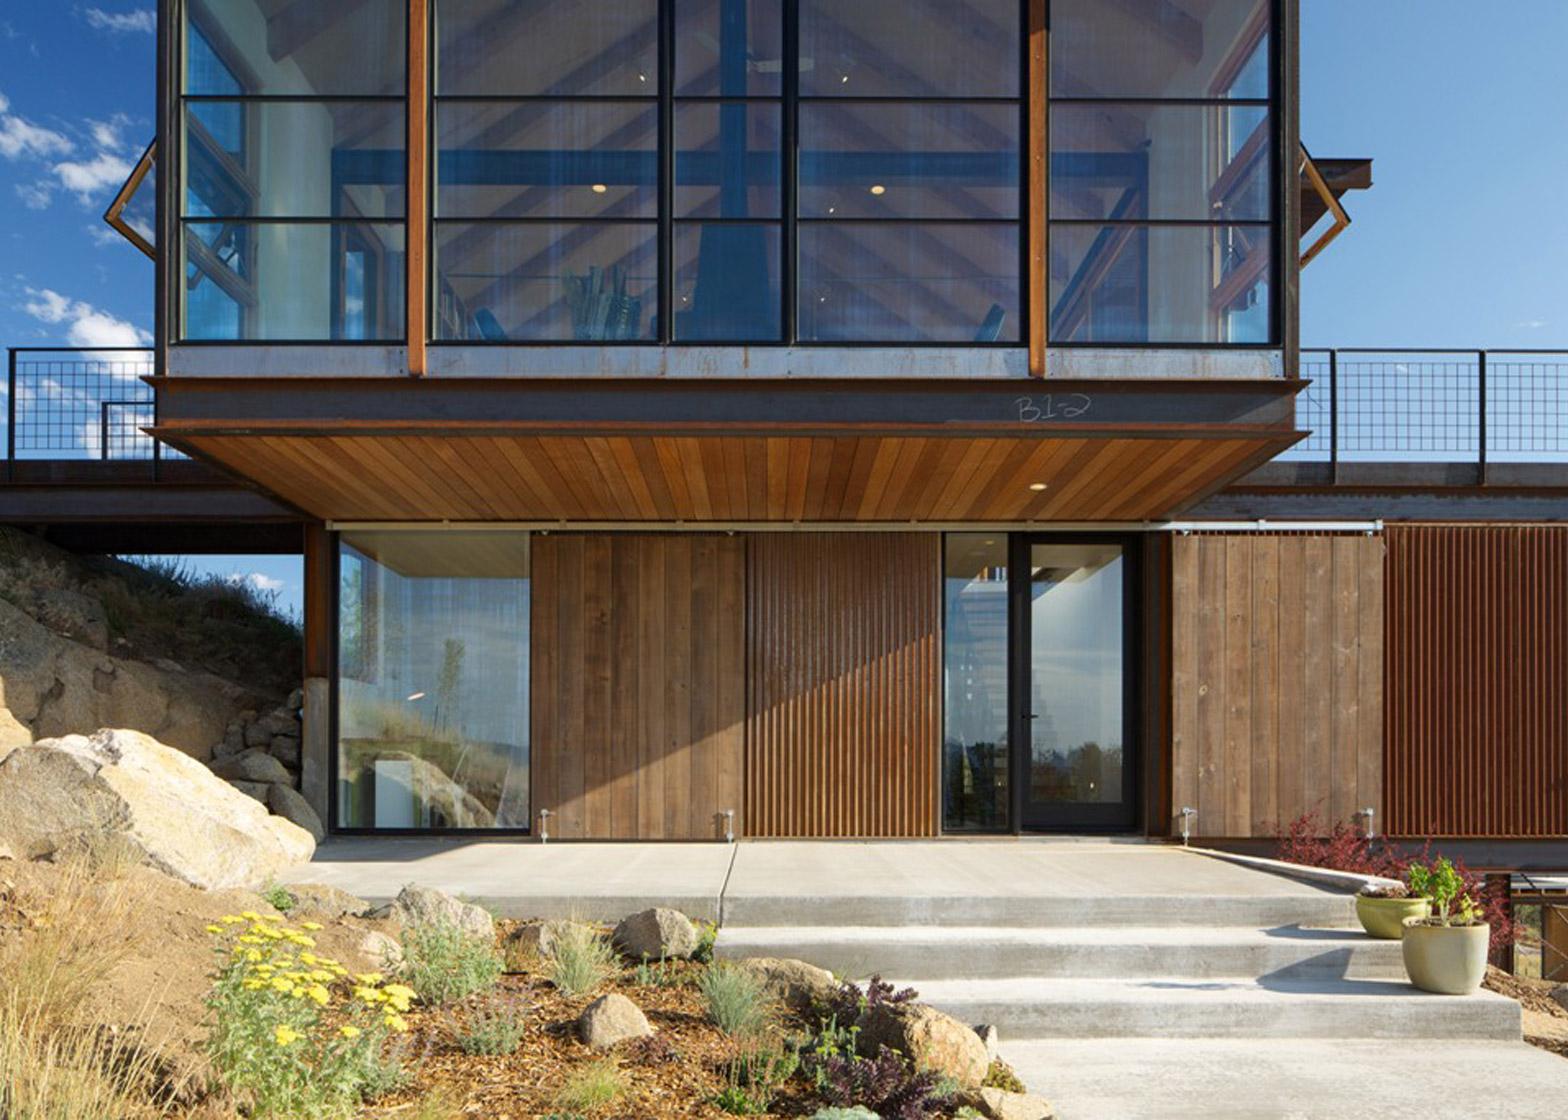 Sunshine Canyon House by Renée del Gaudio Architecture